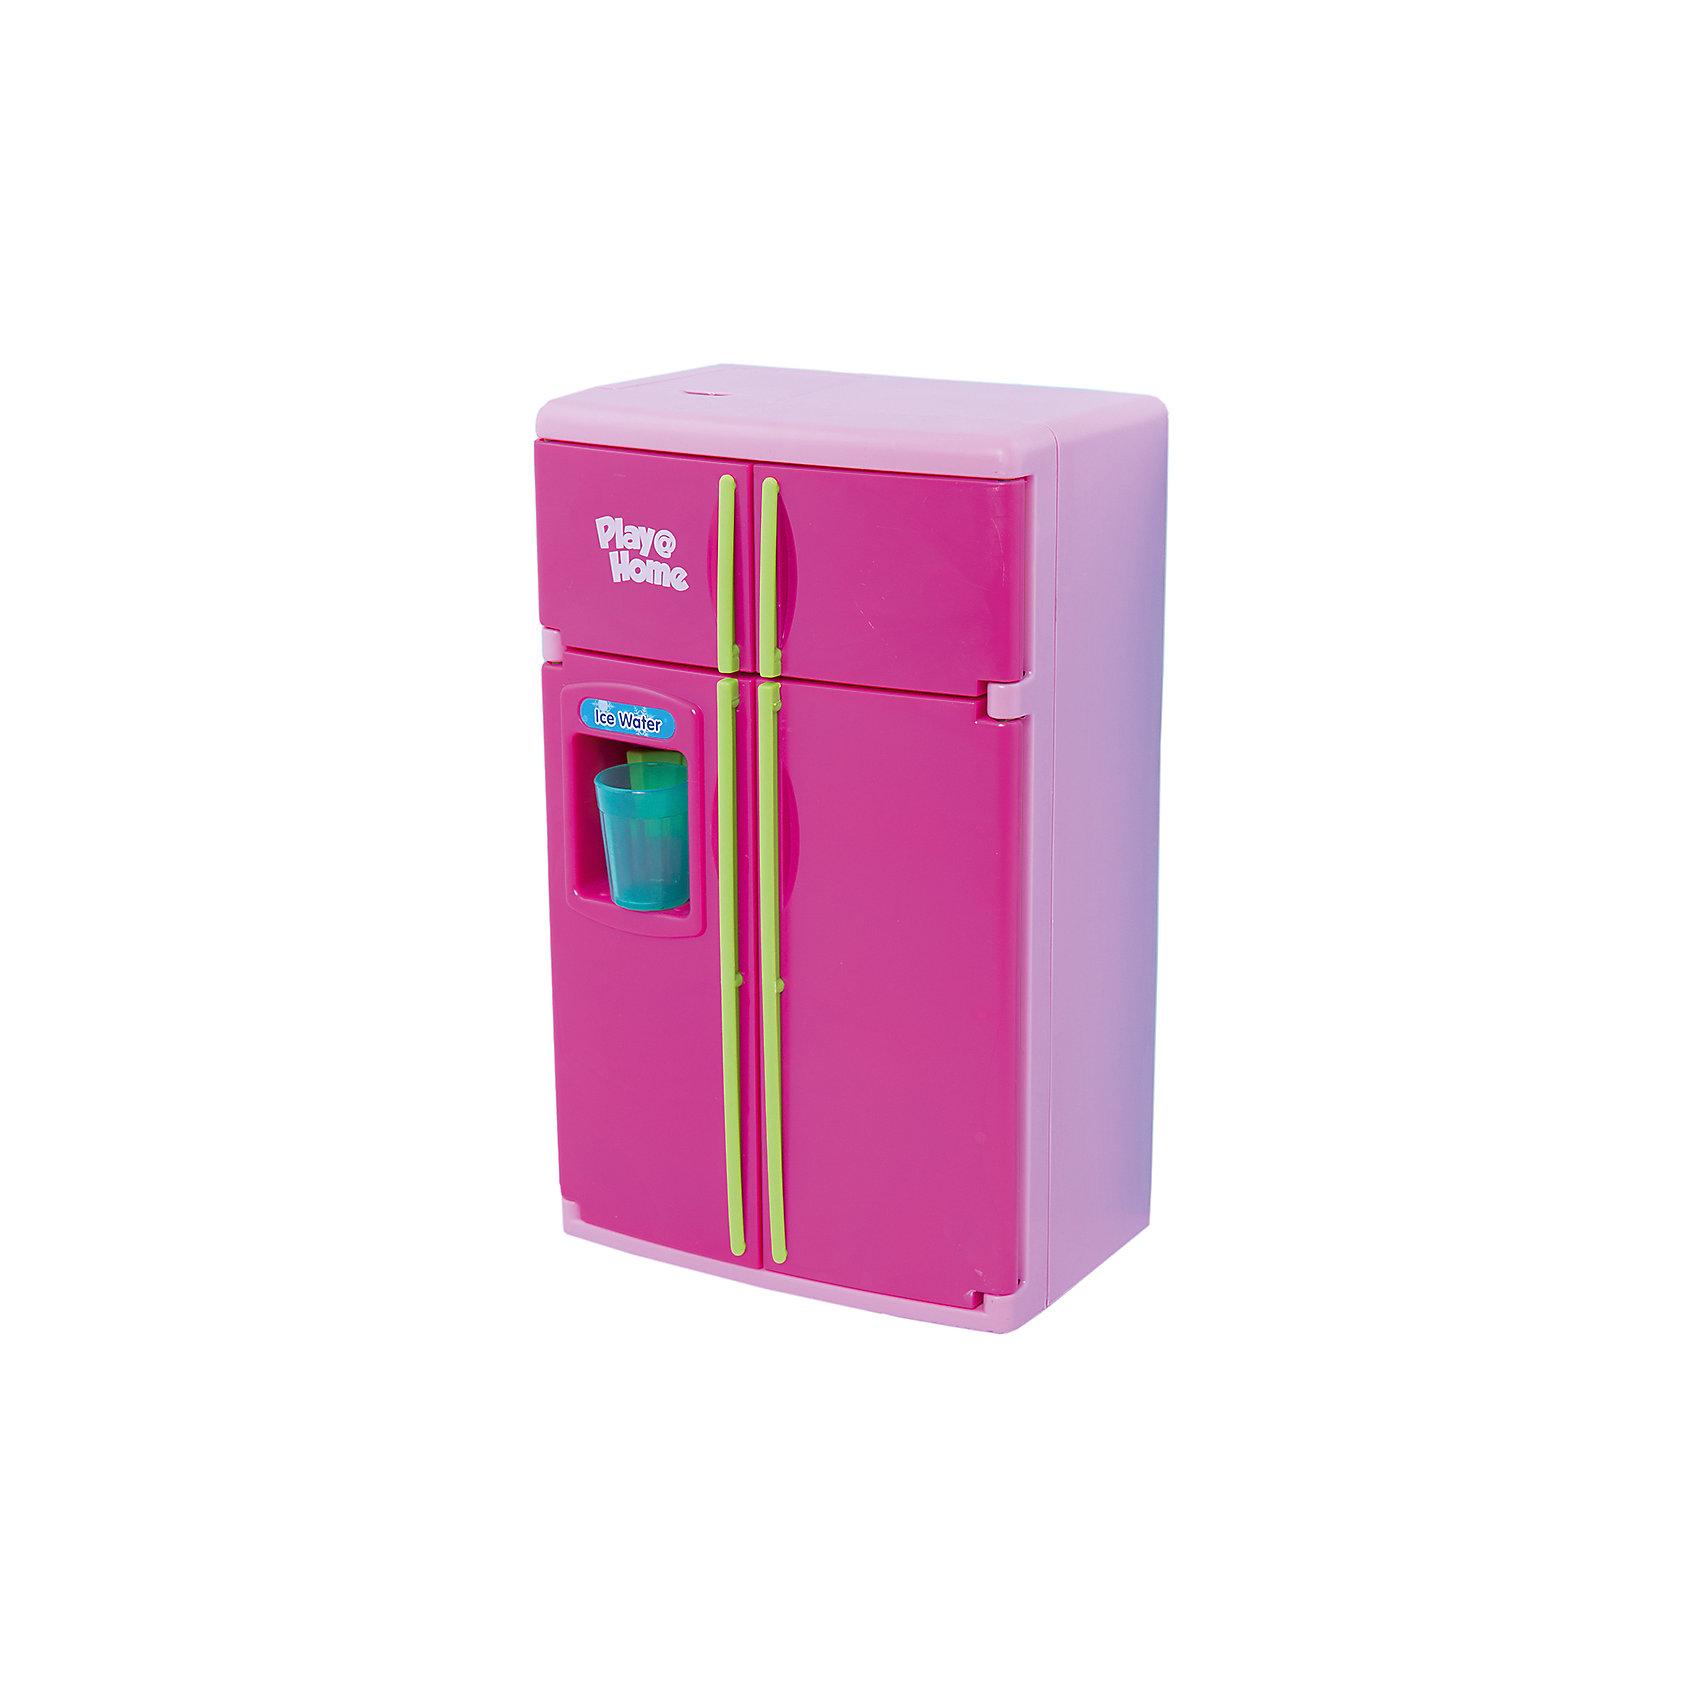 Keenway Холодильник, Keenway купить холодильник бу скупка в иркутске